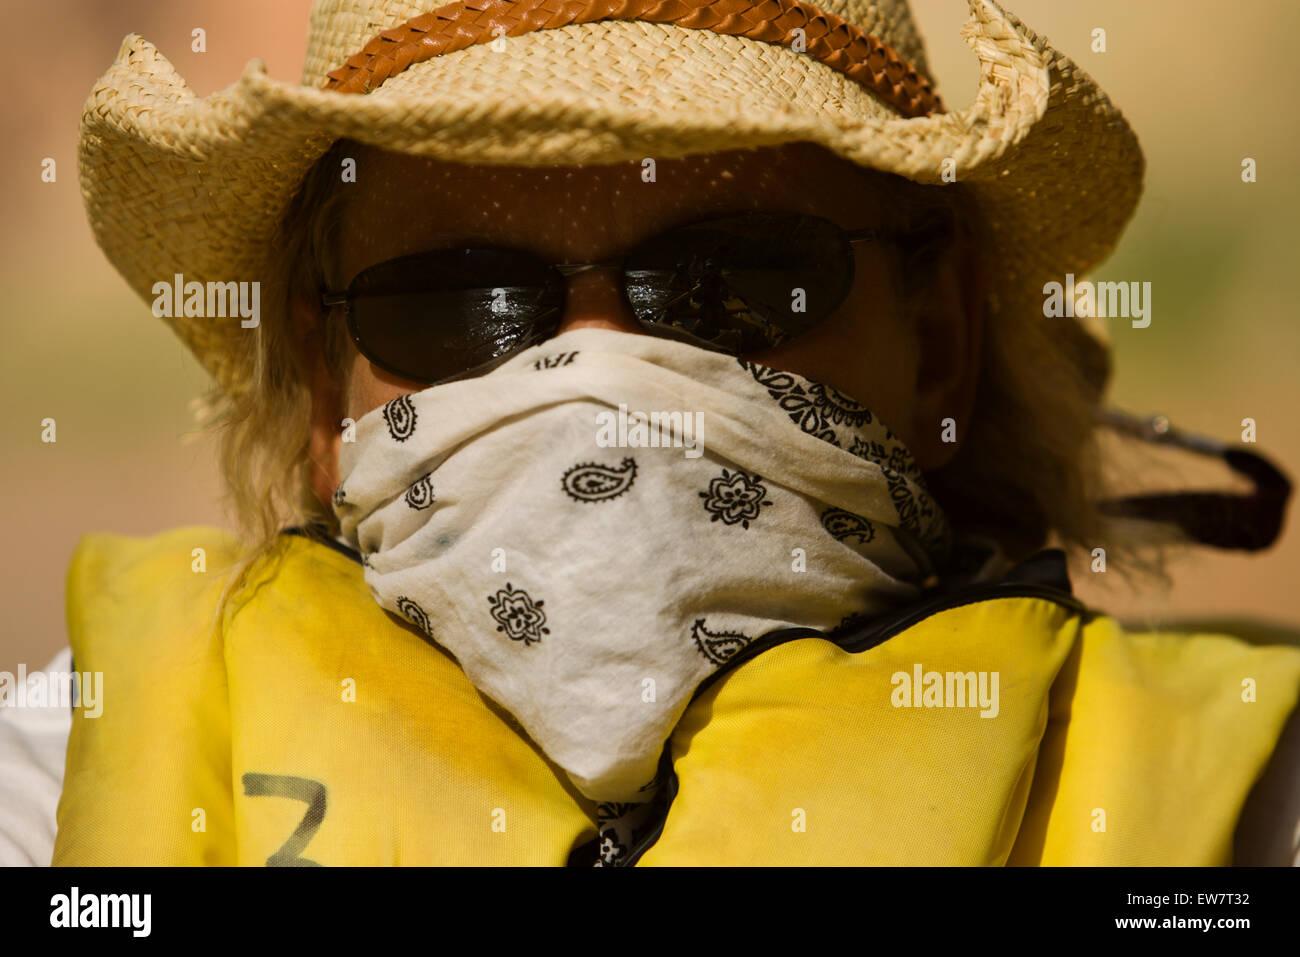 Headshot of a woman wearing a lifejacket, sunglass and staw hat. - Stock Image